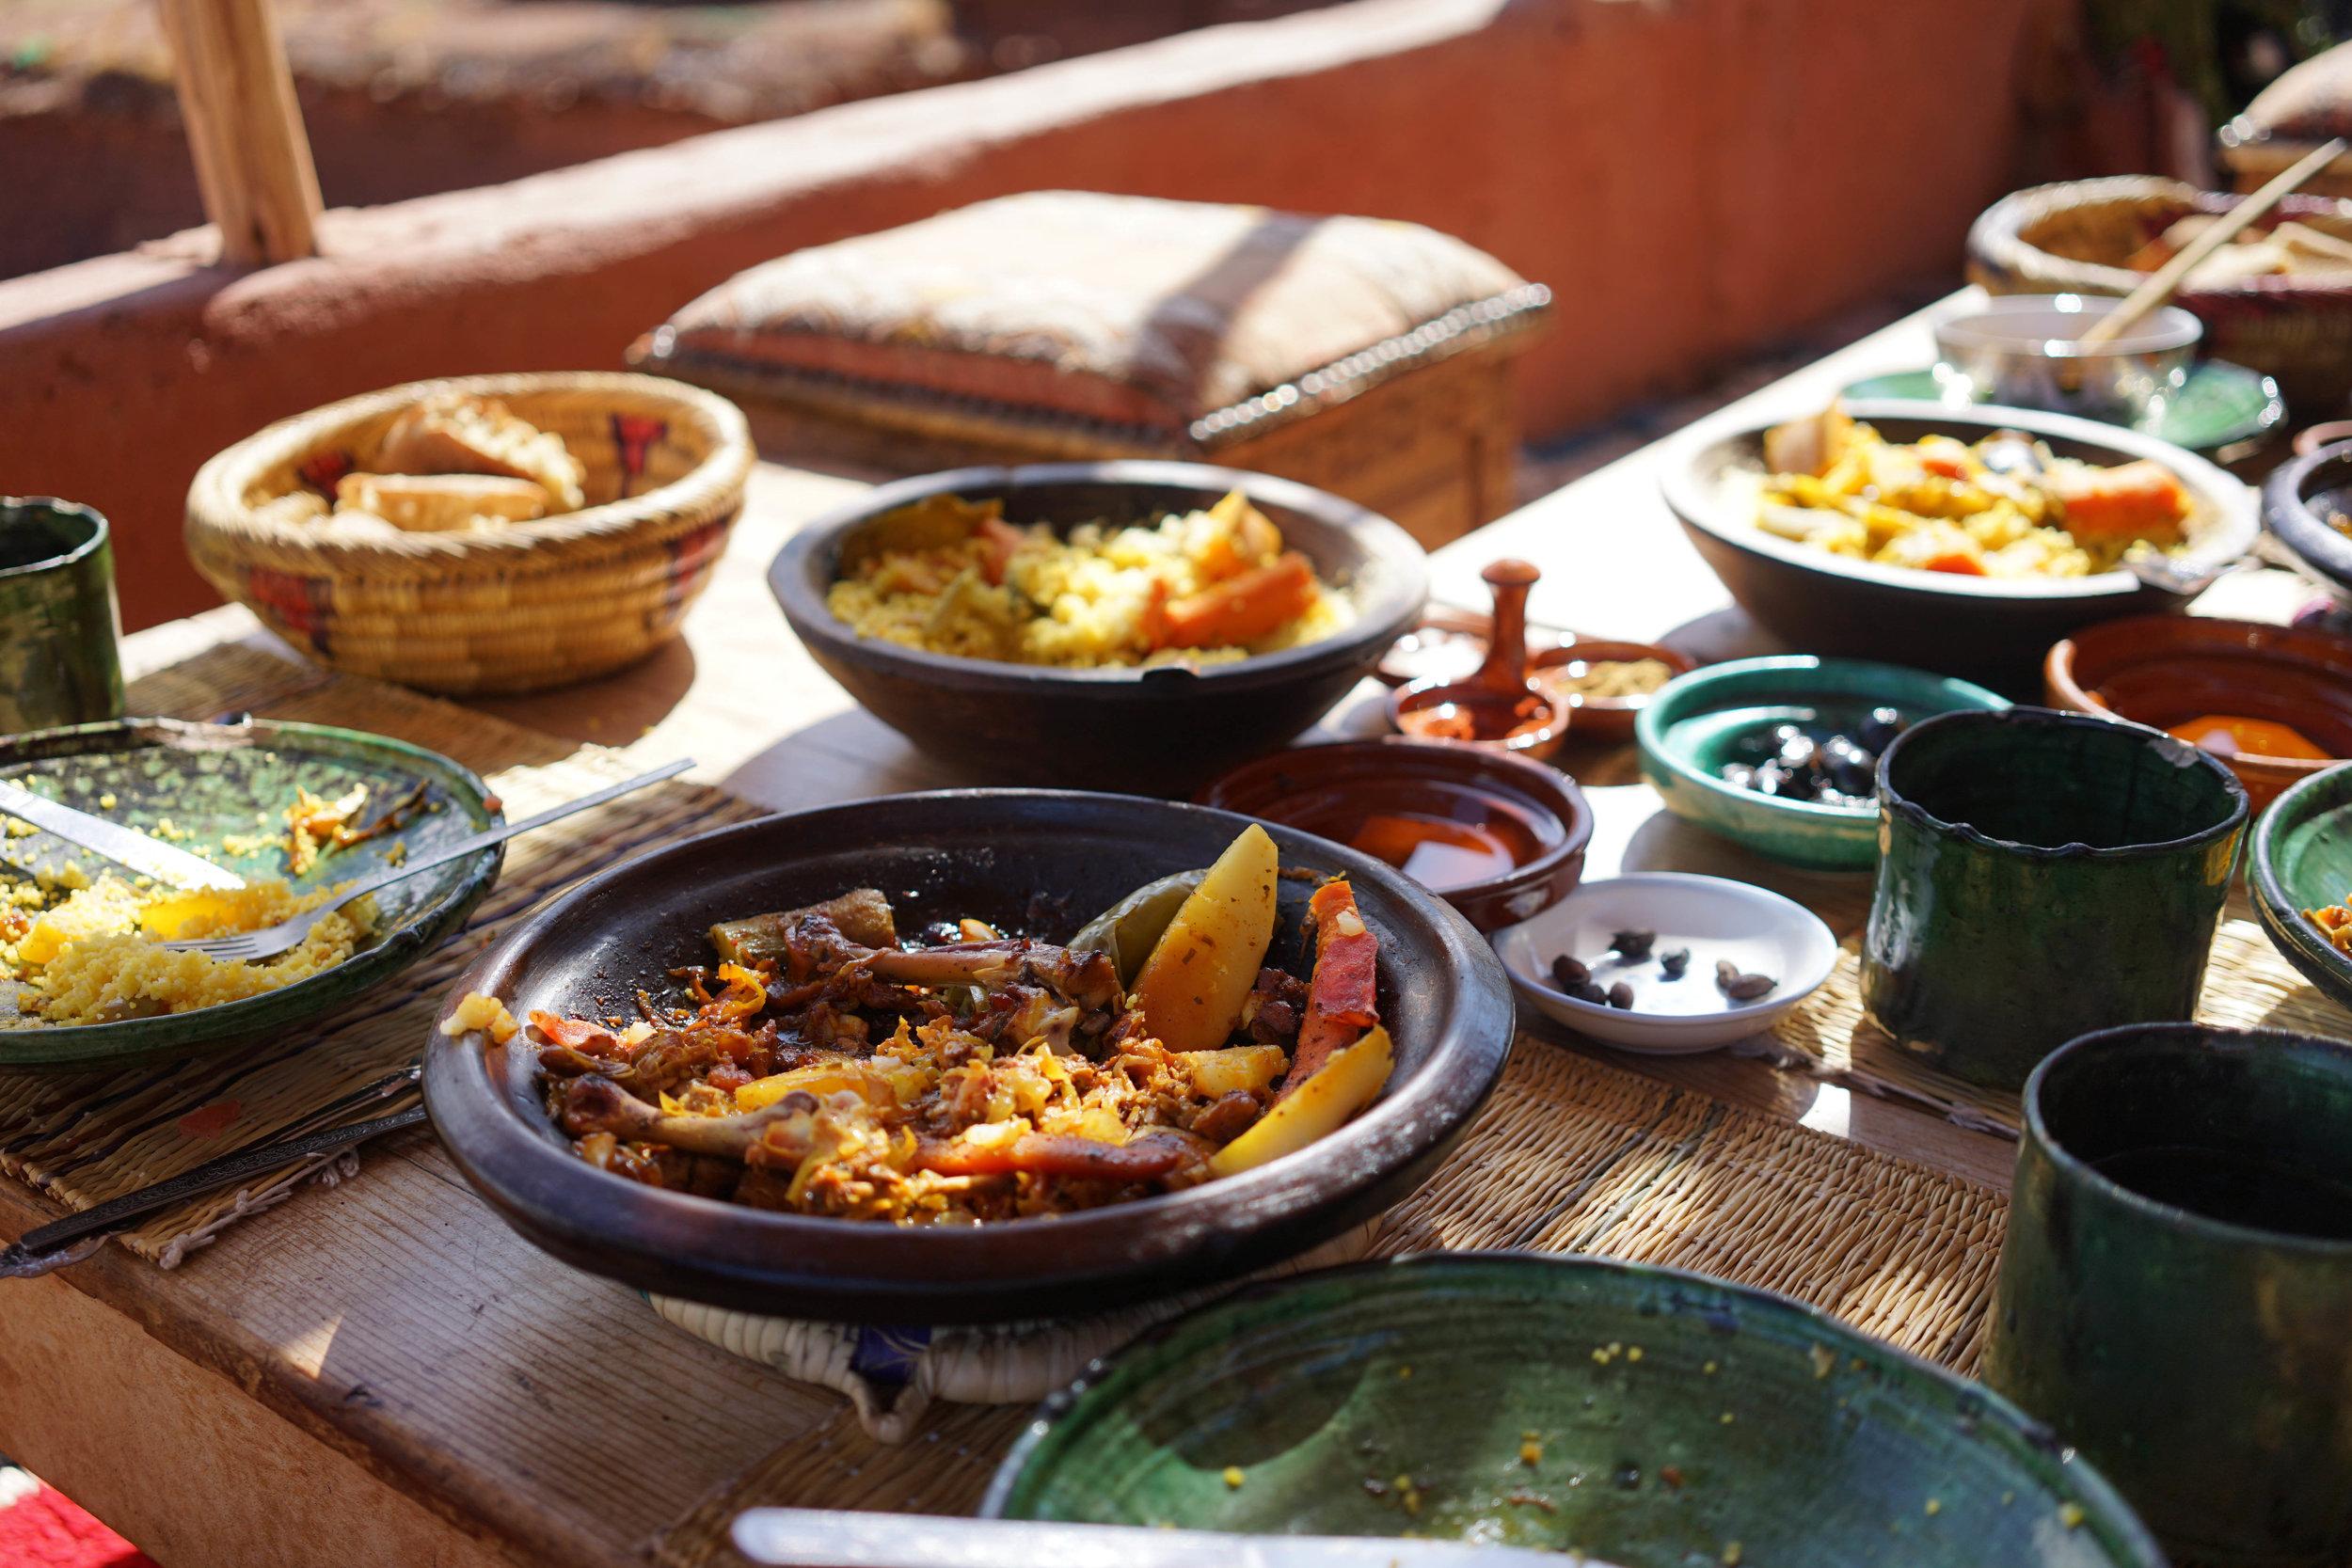 Berber-Family-Authentic-Meal-Chicken-Tajine